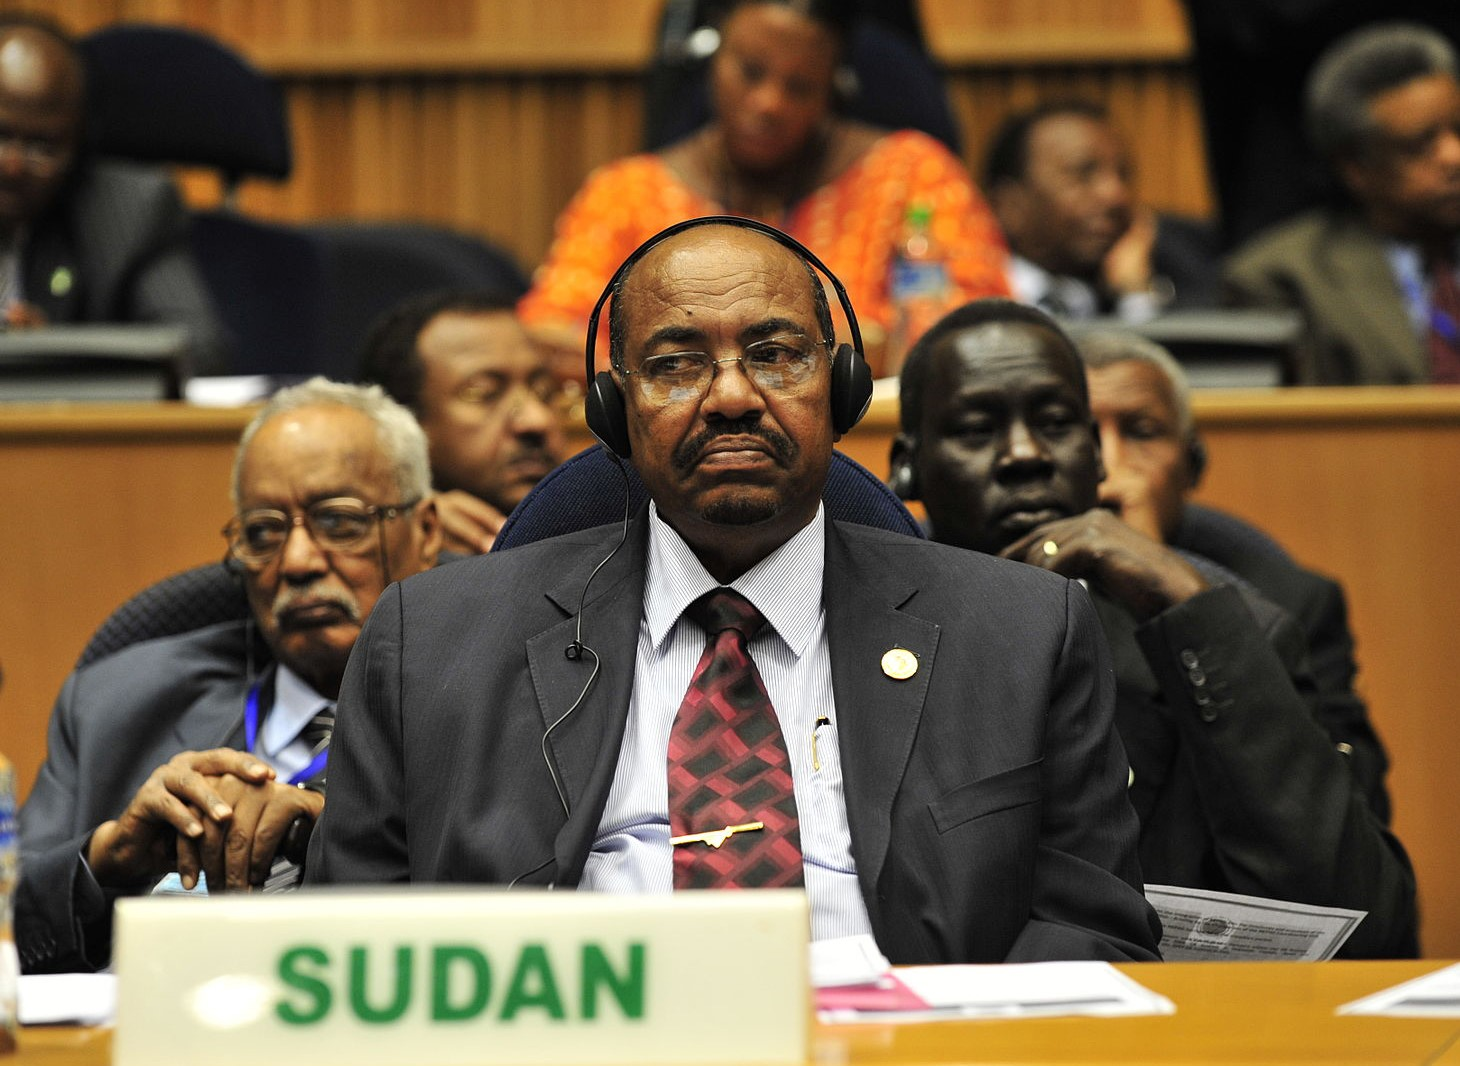 Bashir, ICC development highlights Sudan progress